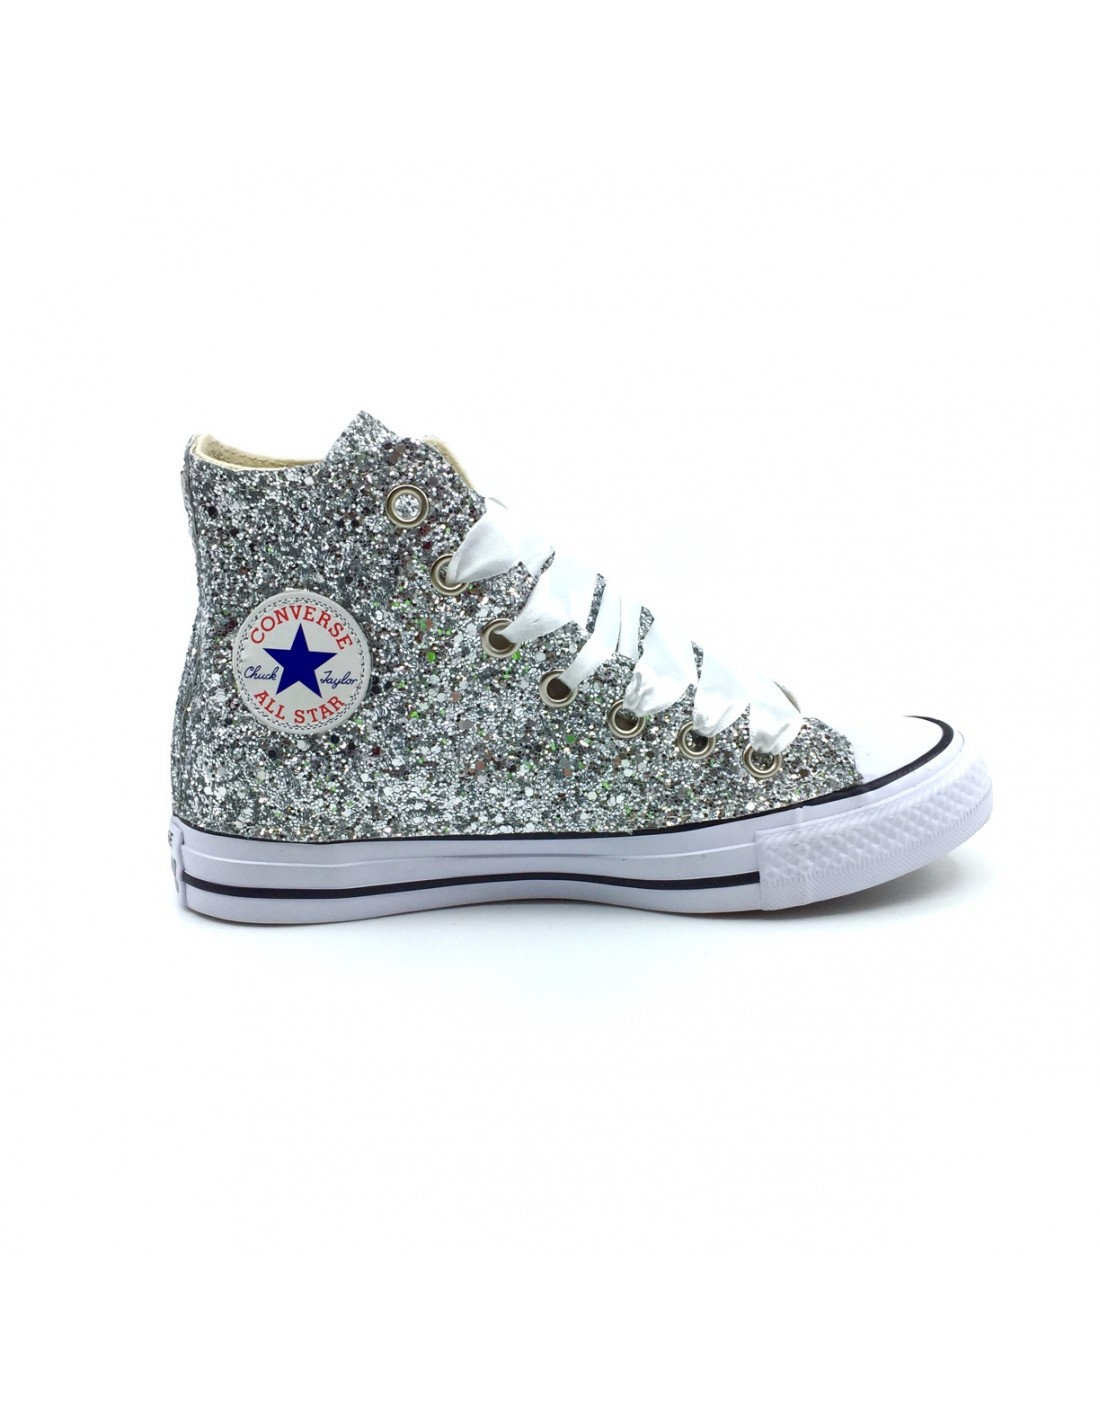 converse all star bianche glitter